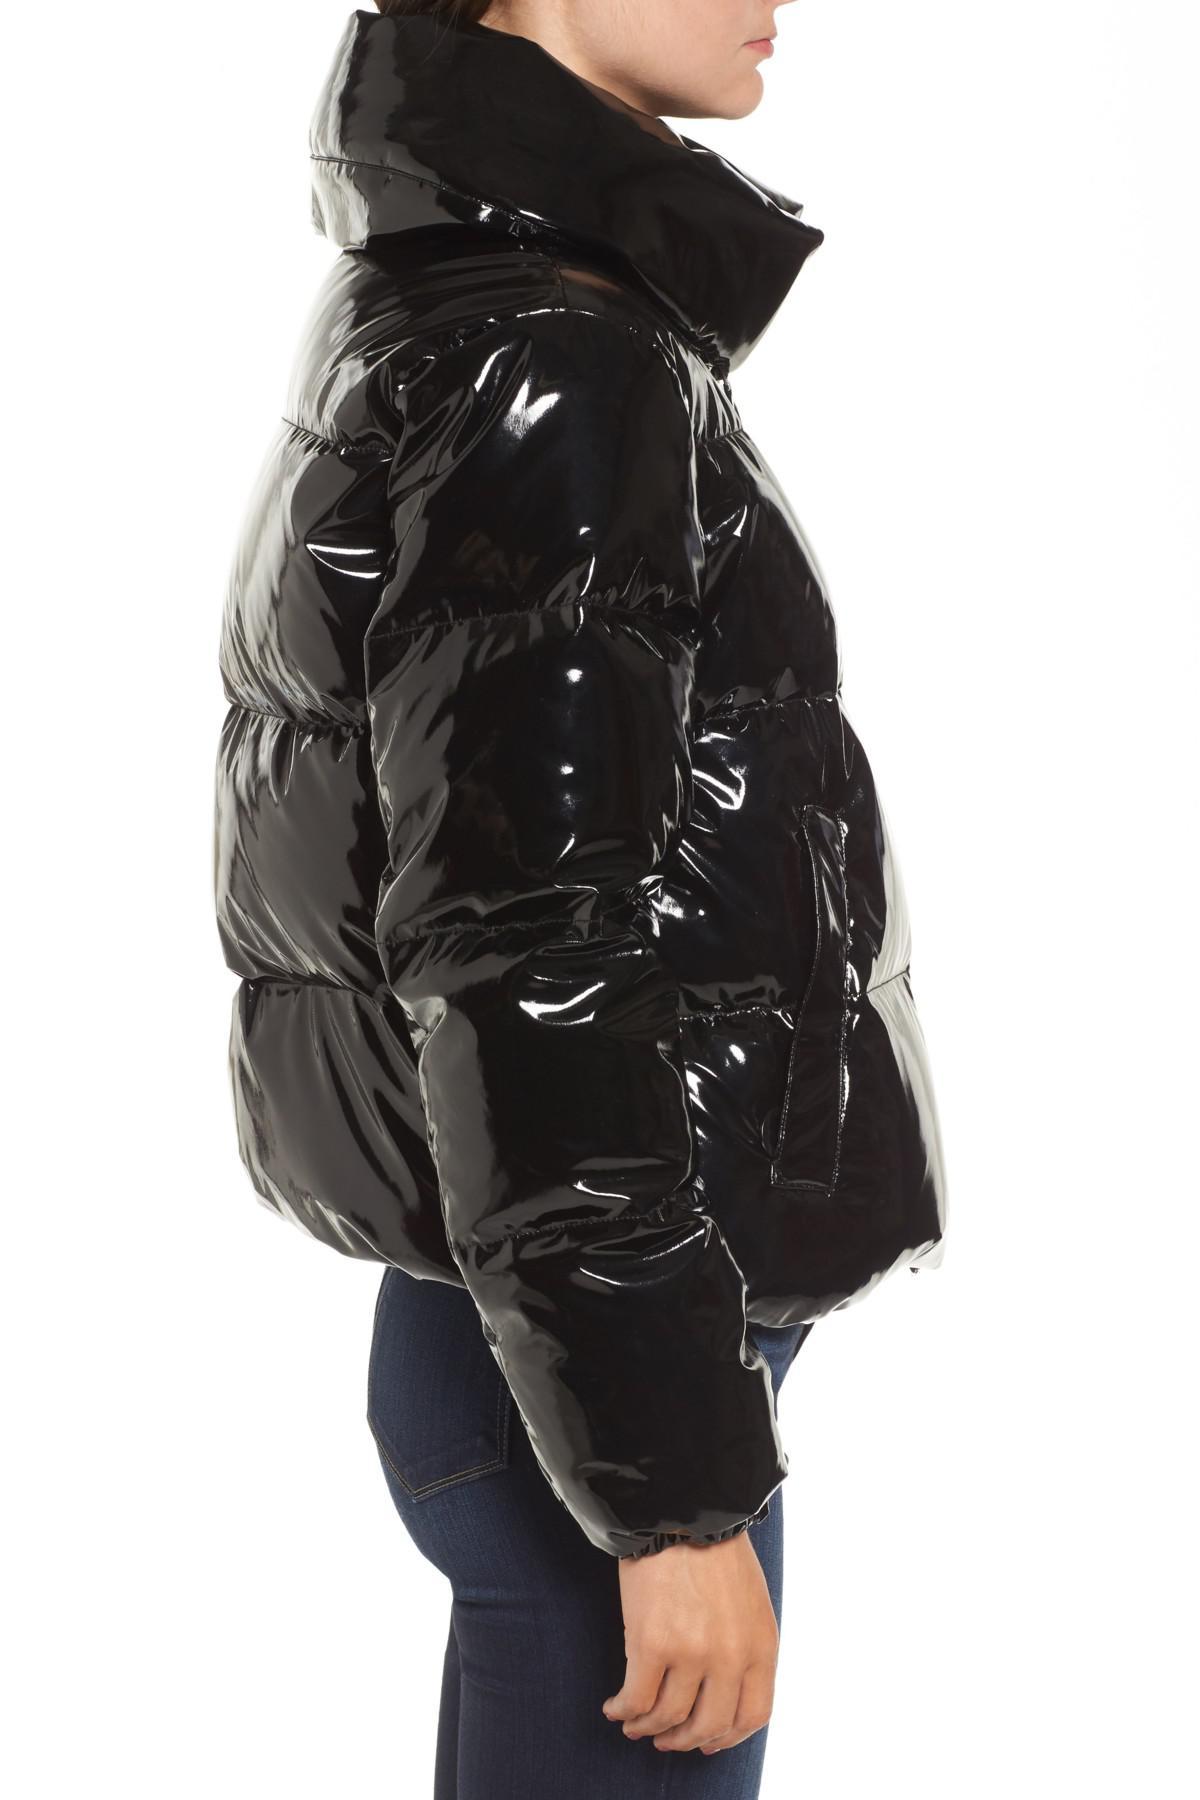 6fce5f8ca41cf Kendall + Kylie Shiny Puffer Jacket in Black - Lyst